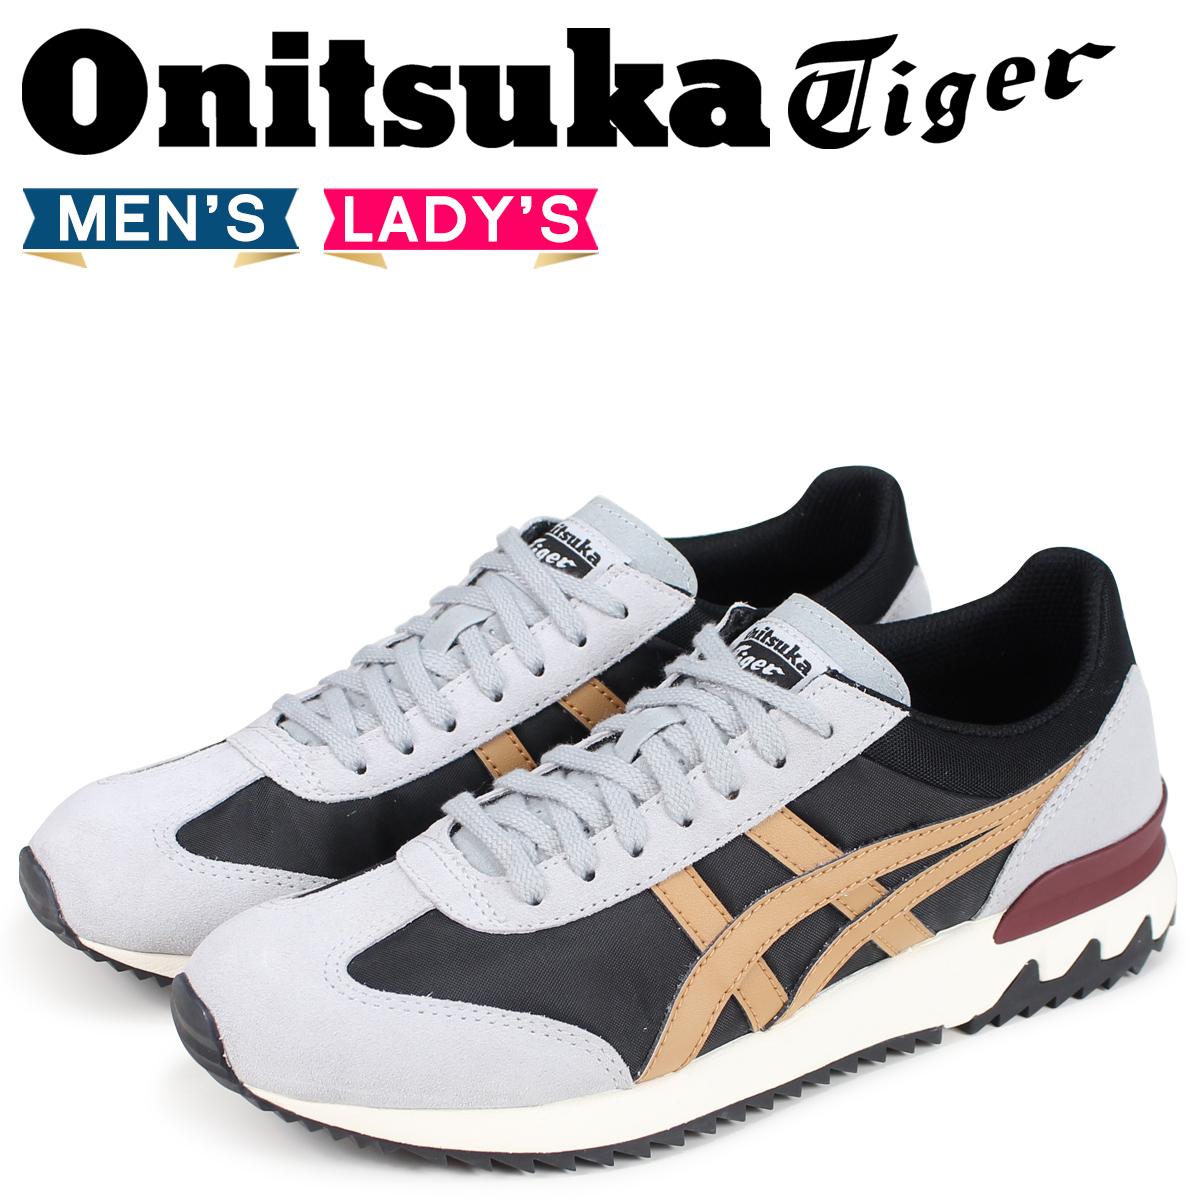 low priced 91748 d6074 Onitsuka Tiger California Onitsuka tiger CALIFORNIA 78 EX men gap Dis  sneakers 1183A194-001 black black